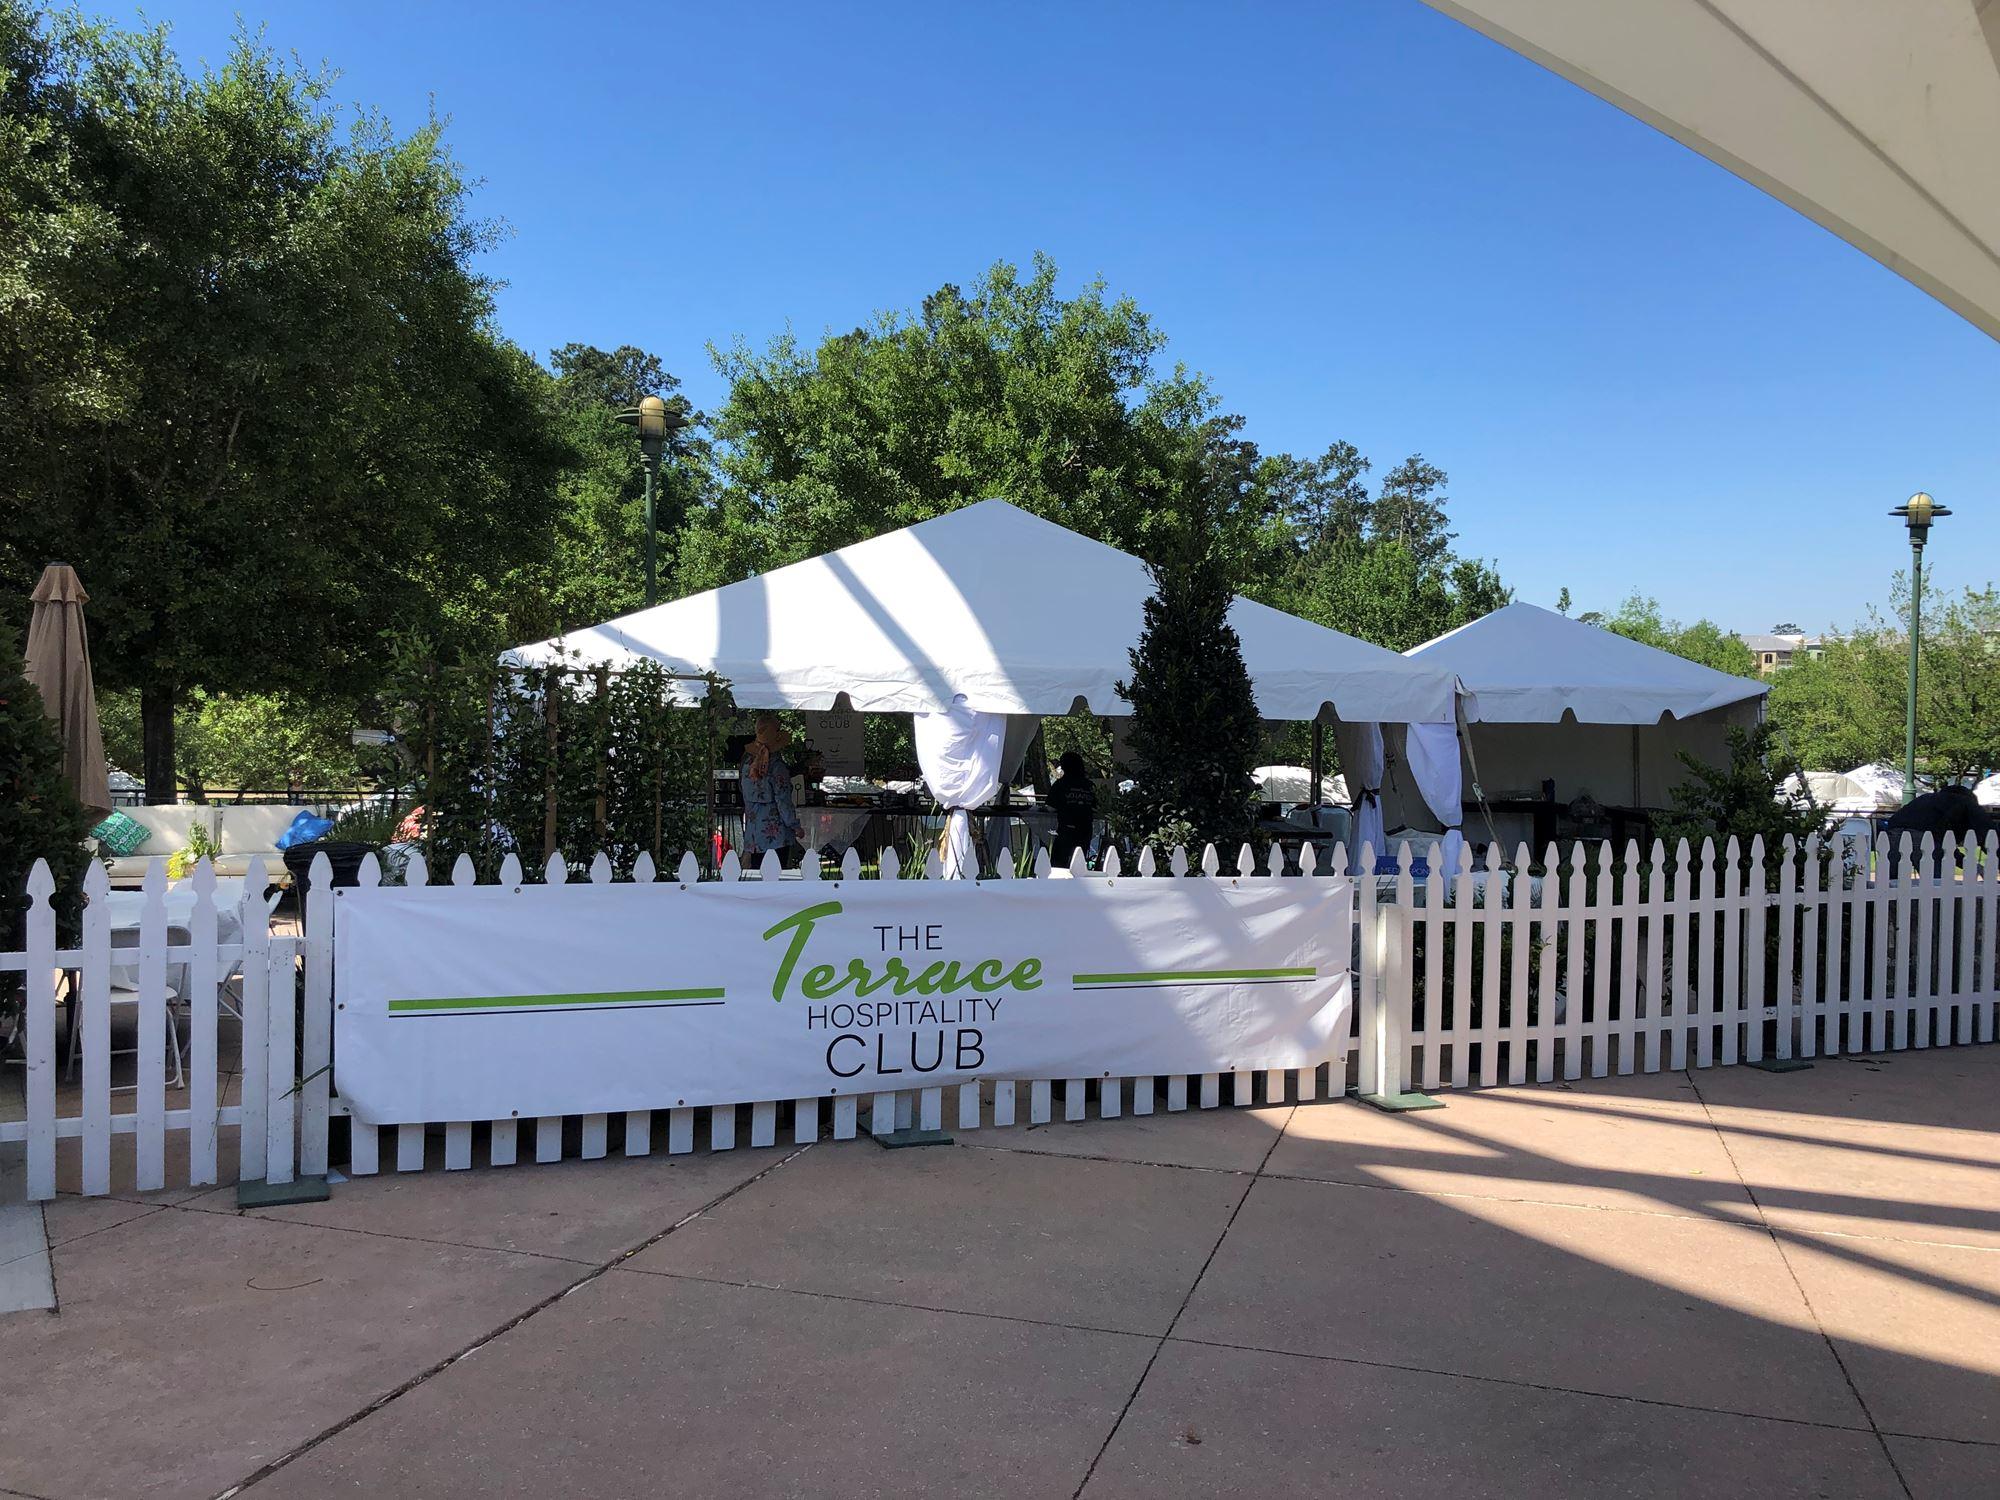 The Terrace Hospitality Club tent